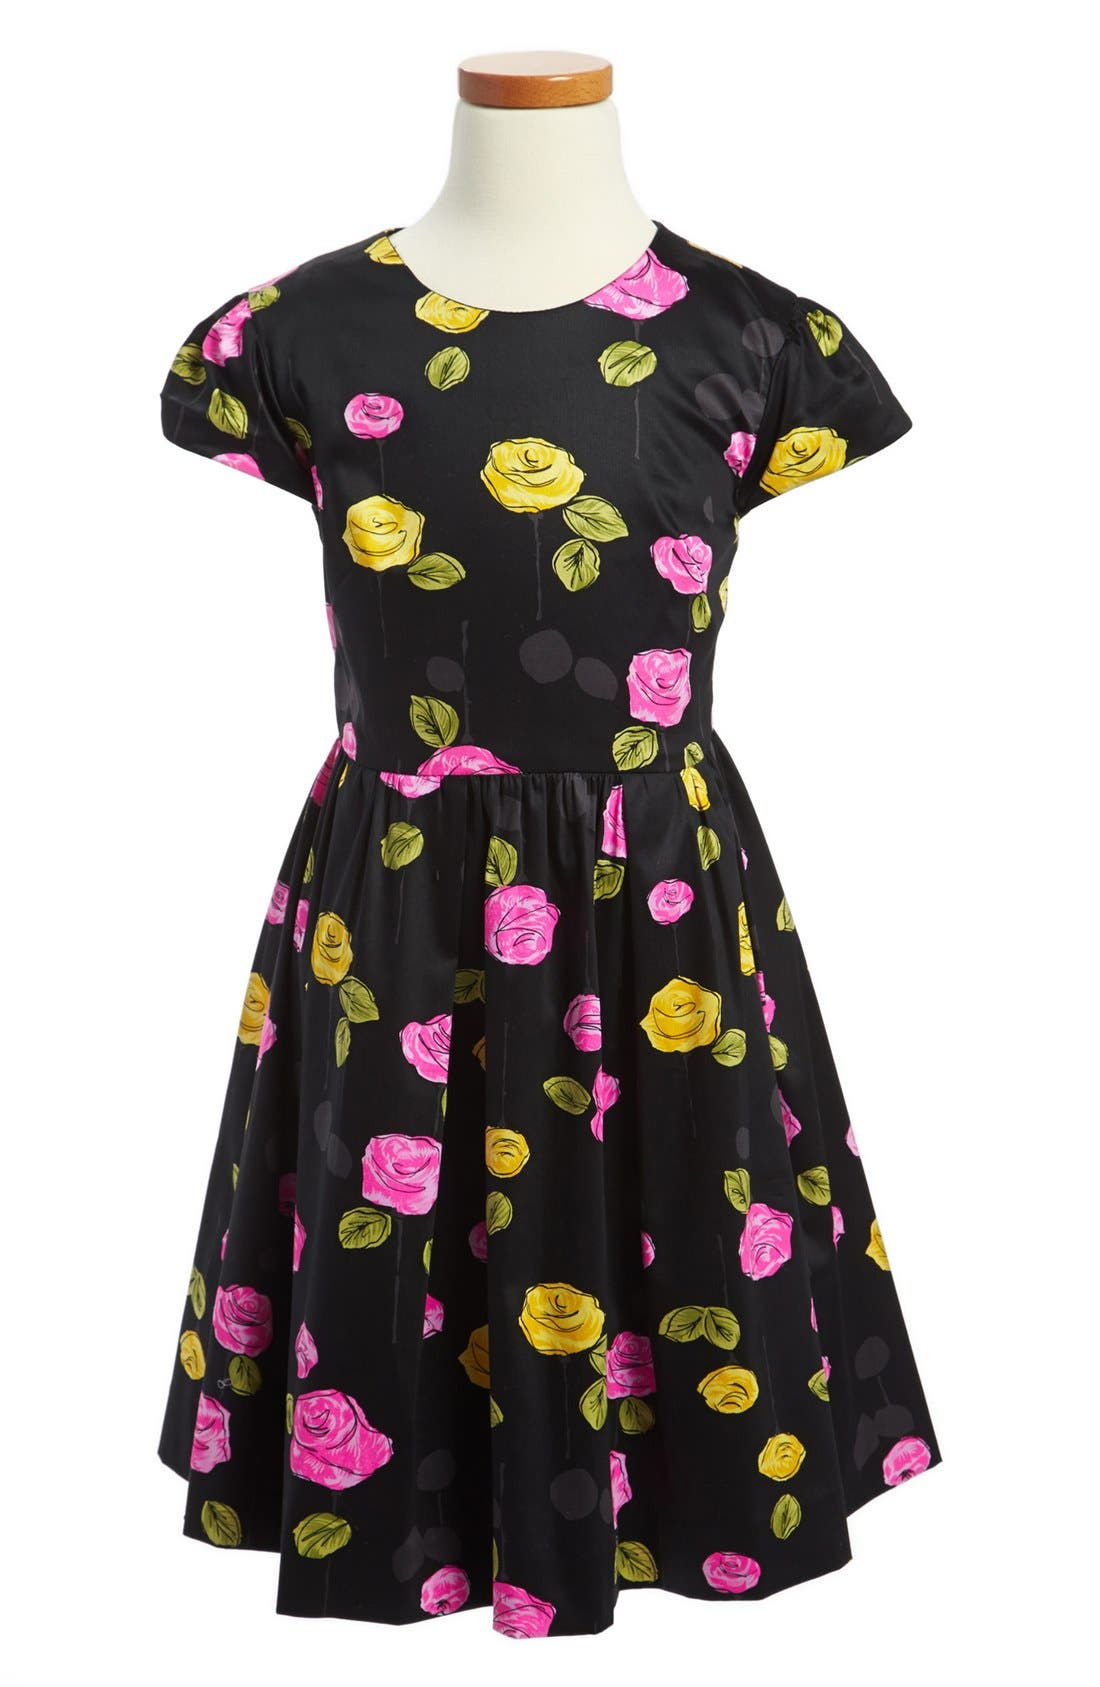 Main Image - Milly Minis 'Mischa' Dress (Toddler Girls, Little Girls & Big Girls)